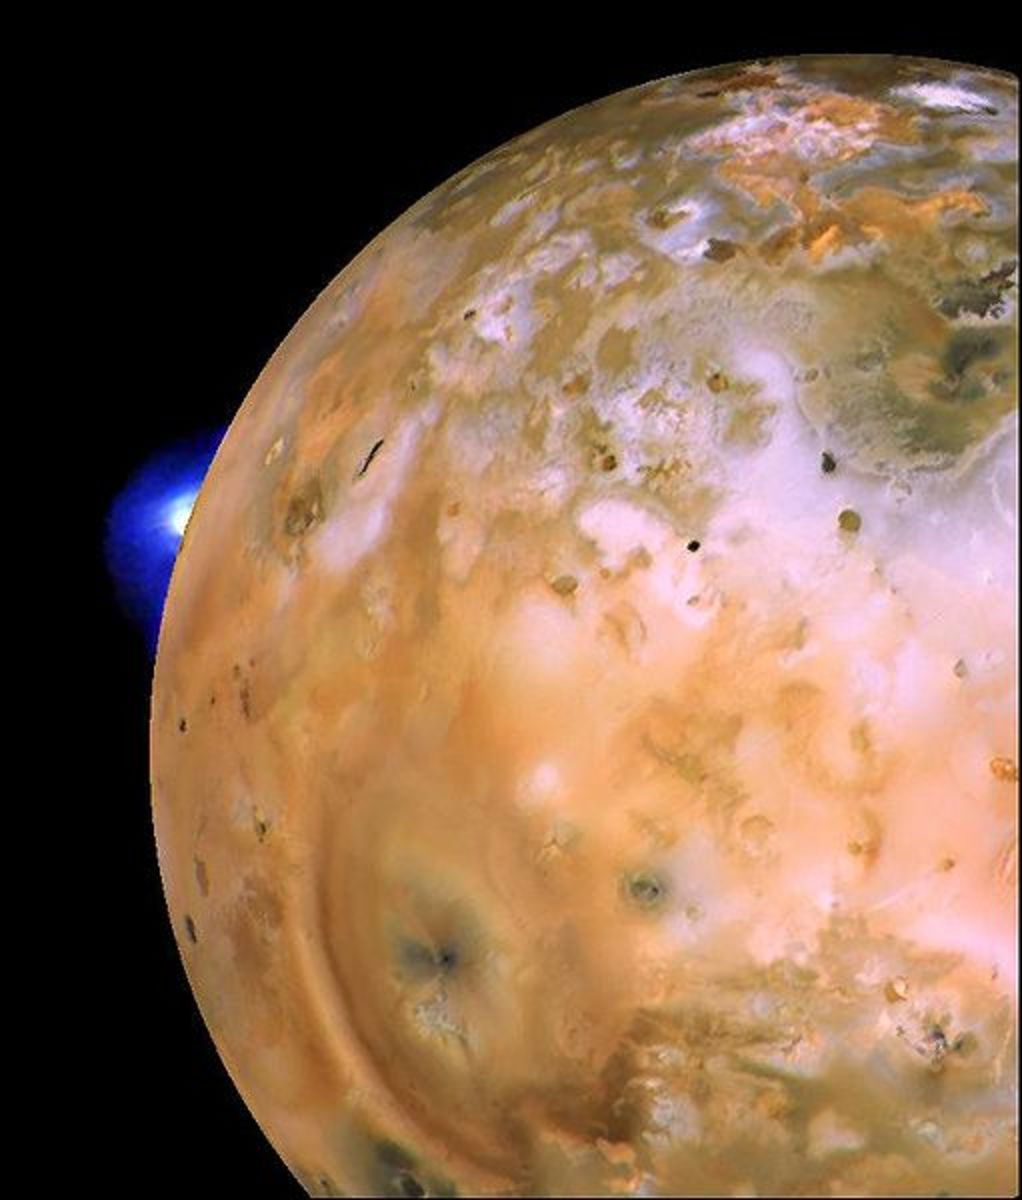 Voyager 1 image of Io (moon on Jupiter) showing active plume of Loki.